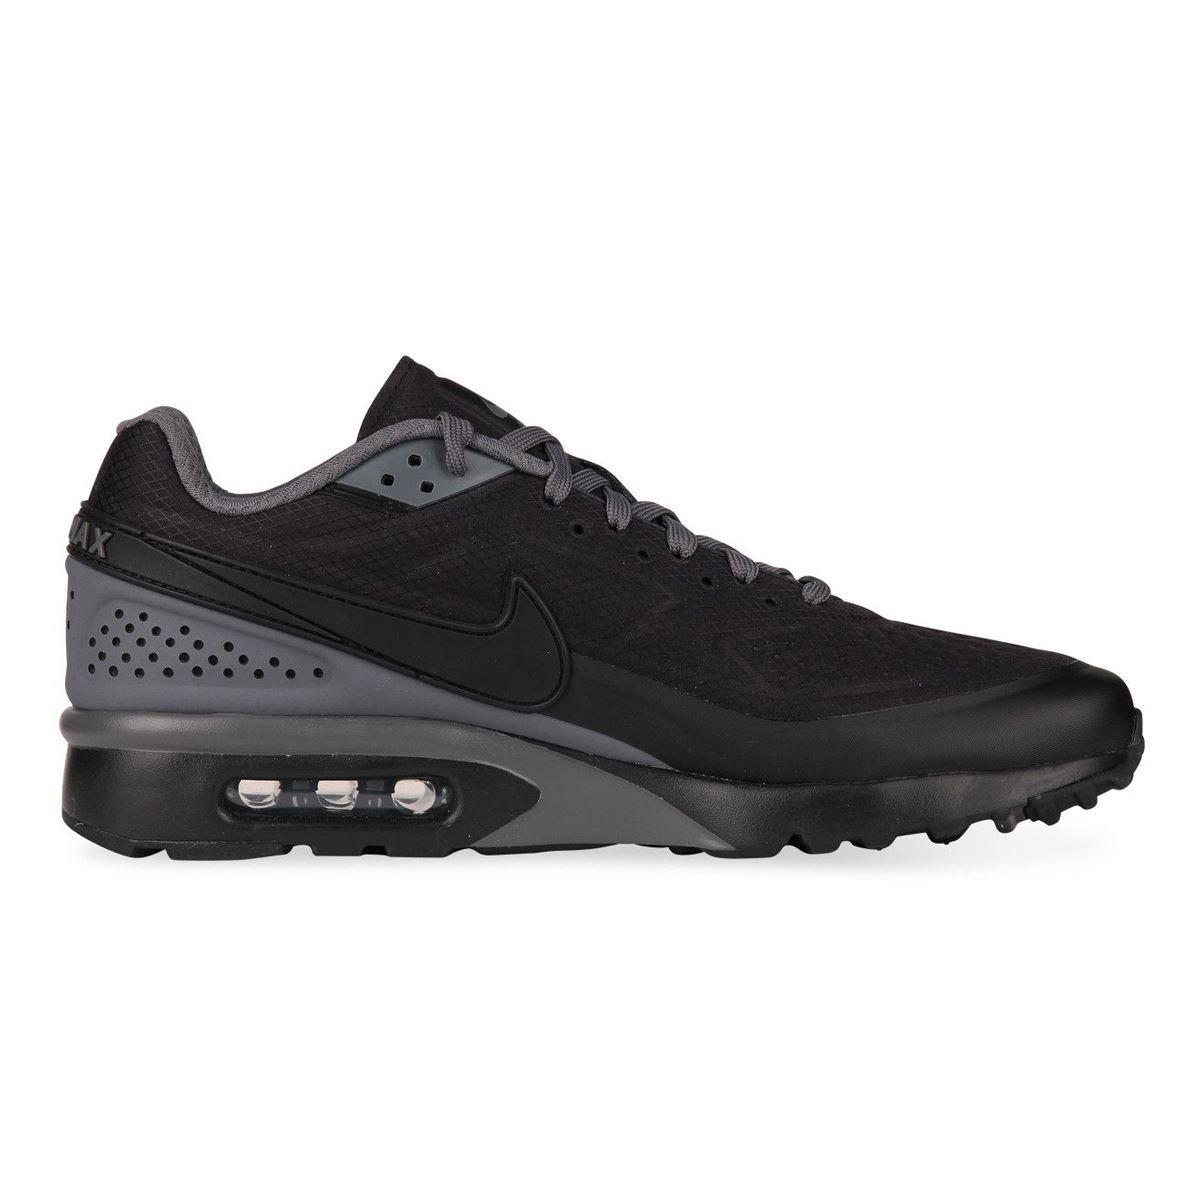 Nike Herren 844967-002 Fitnessschuhe  40 EU Verschiedene Farben (Black / Black-dark Grey-anthracite)